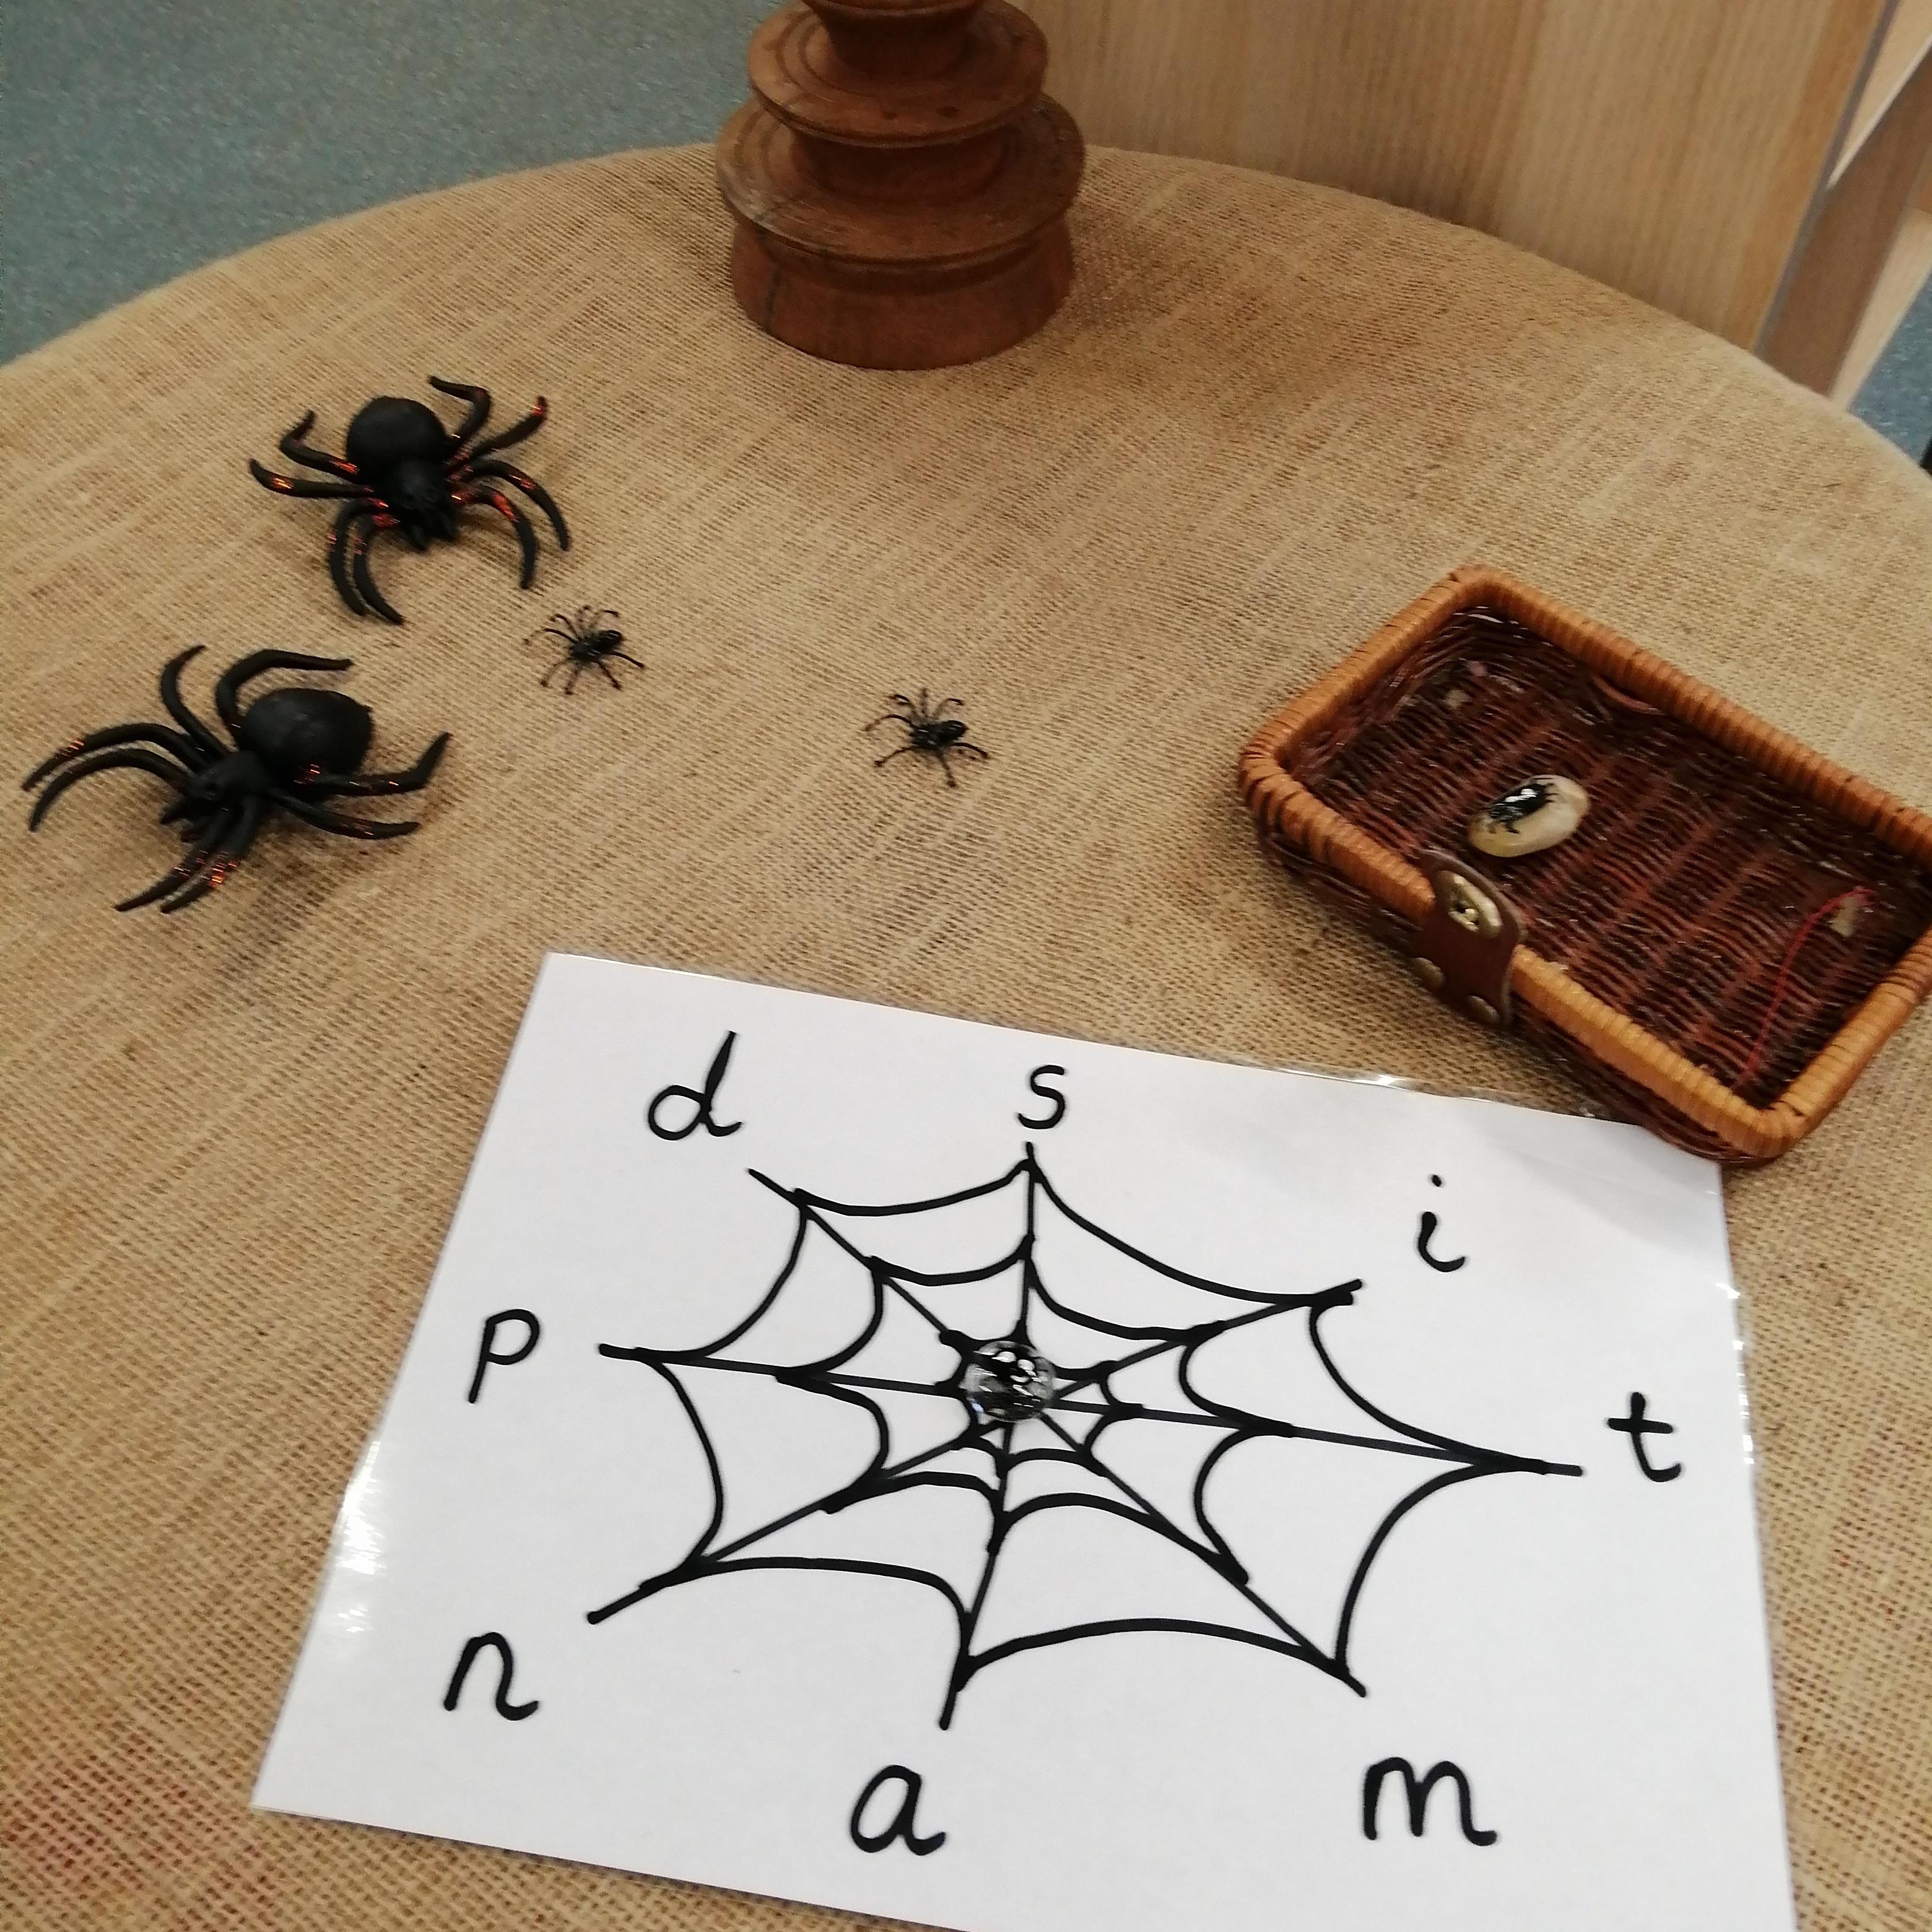 Spider-web-reading